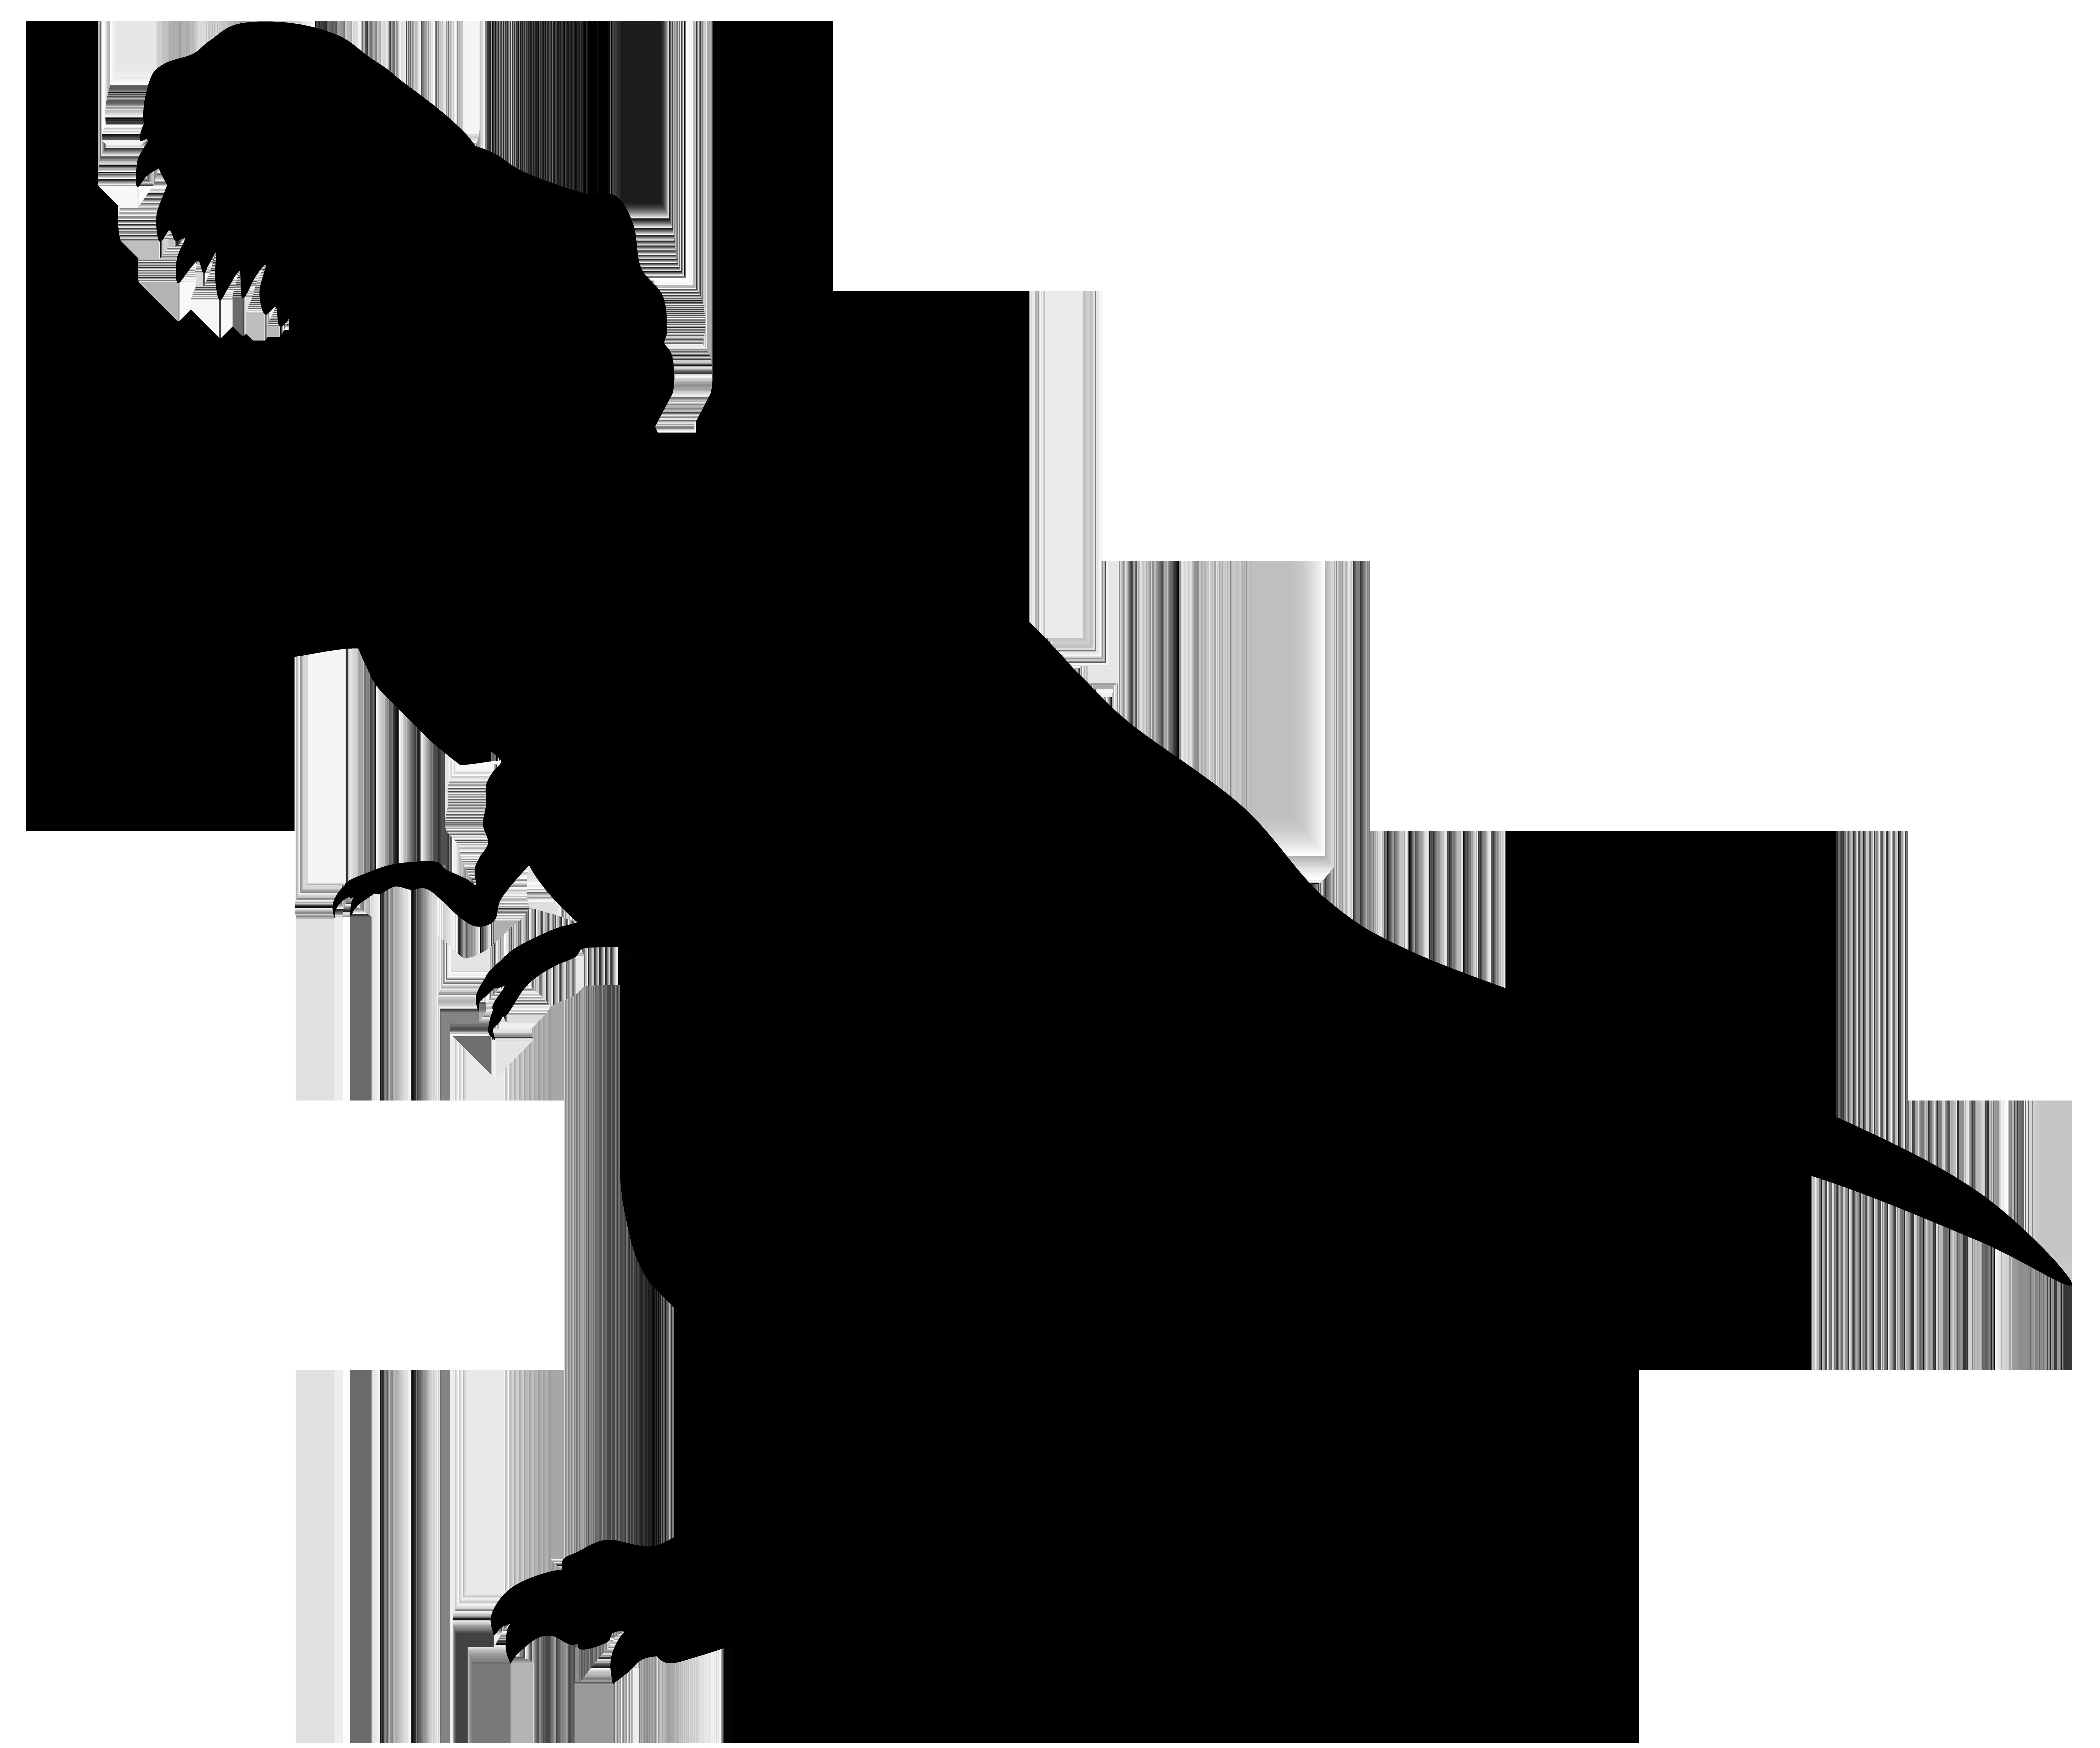 8000x6660 Tyrannosaurus Clipart Silhouette